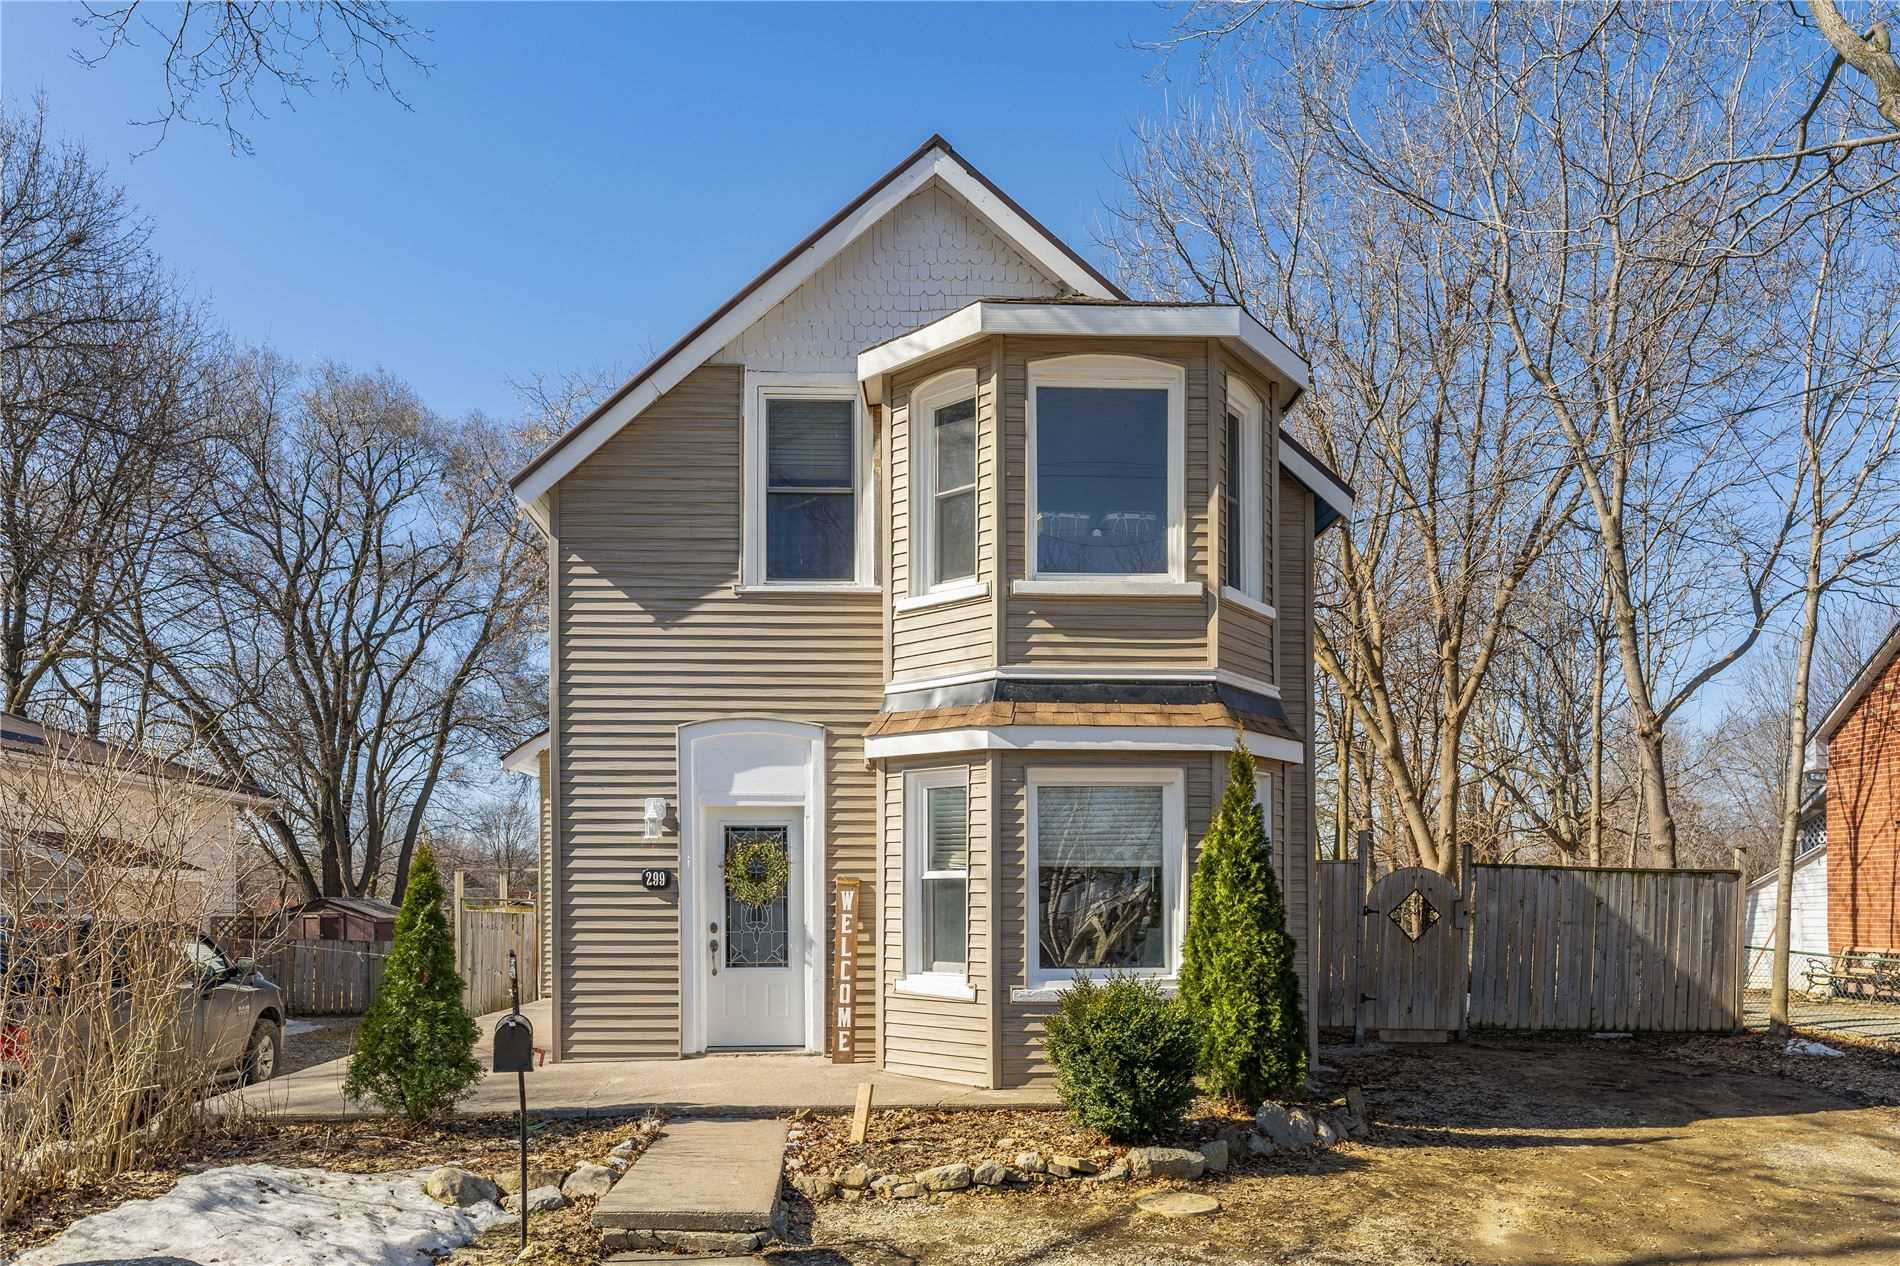 299 East St, Orillia, Ontario L3V4C1, 3 Bedrooms Bedrooms, ,2 BathroomsBathrooms,Detached,For Sale,East,S5161603